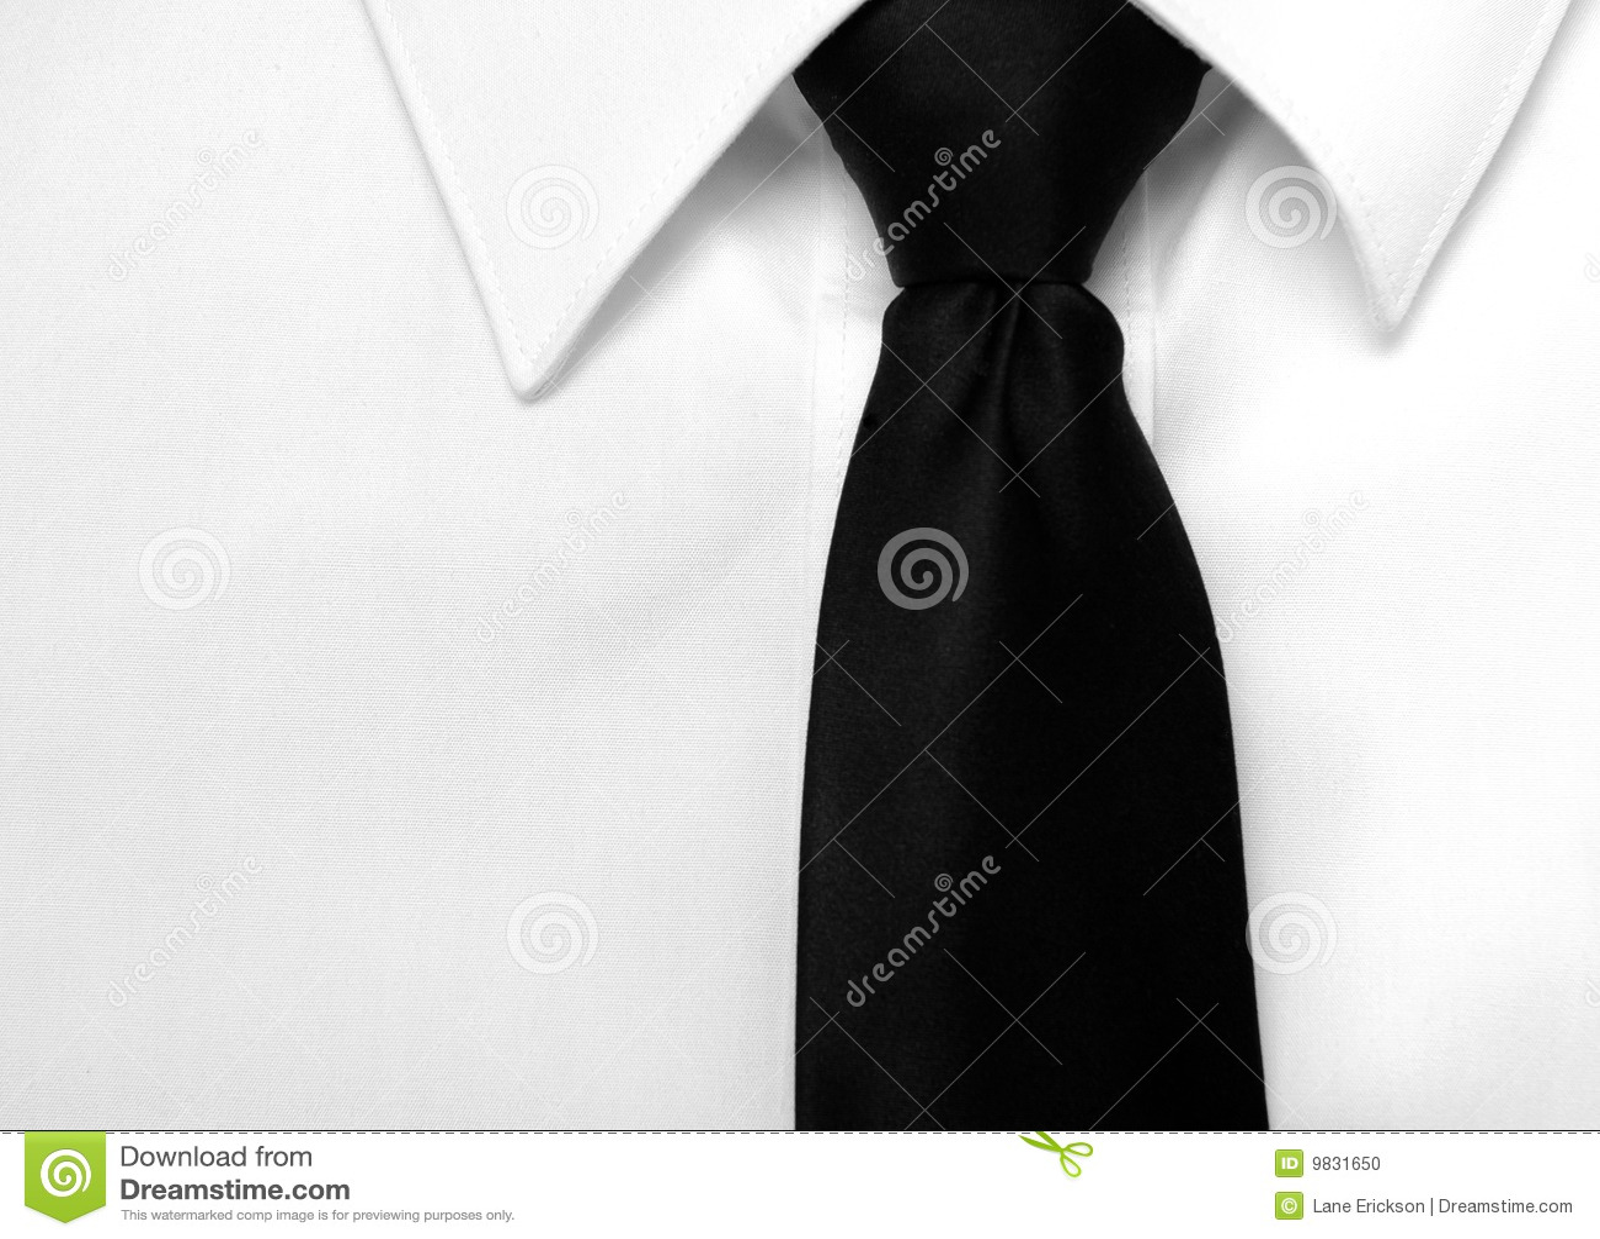 Dress shirt black tie stock photo image 9831650 for Black shirt black tie